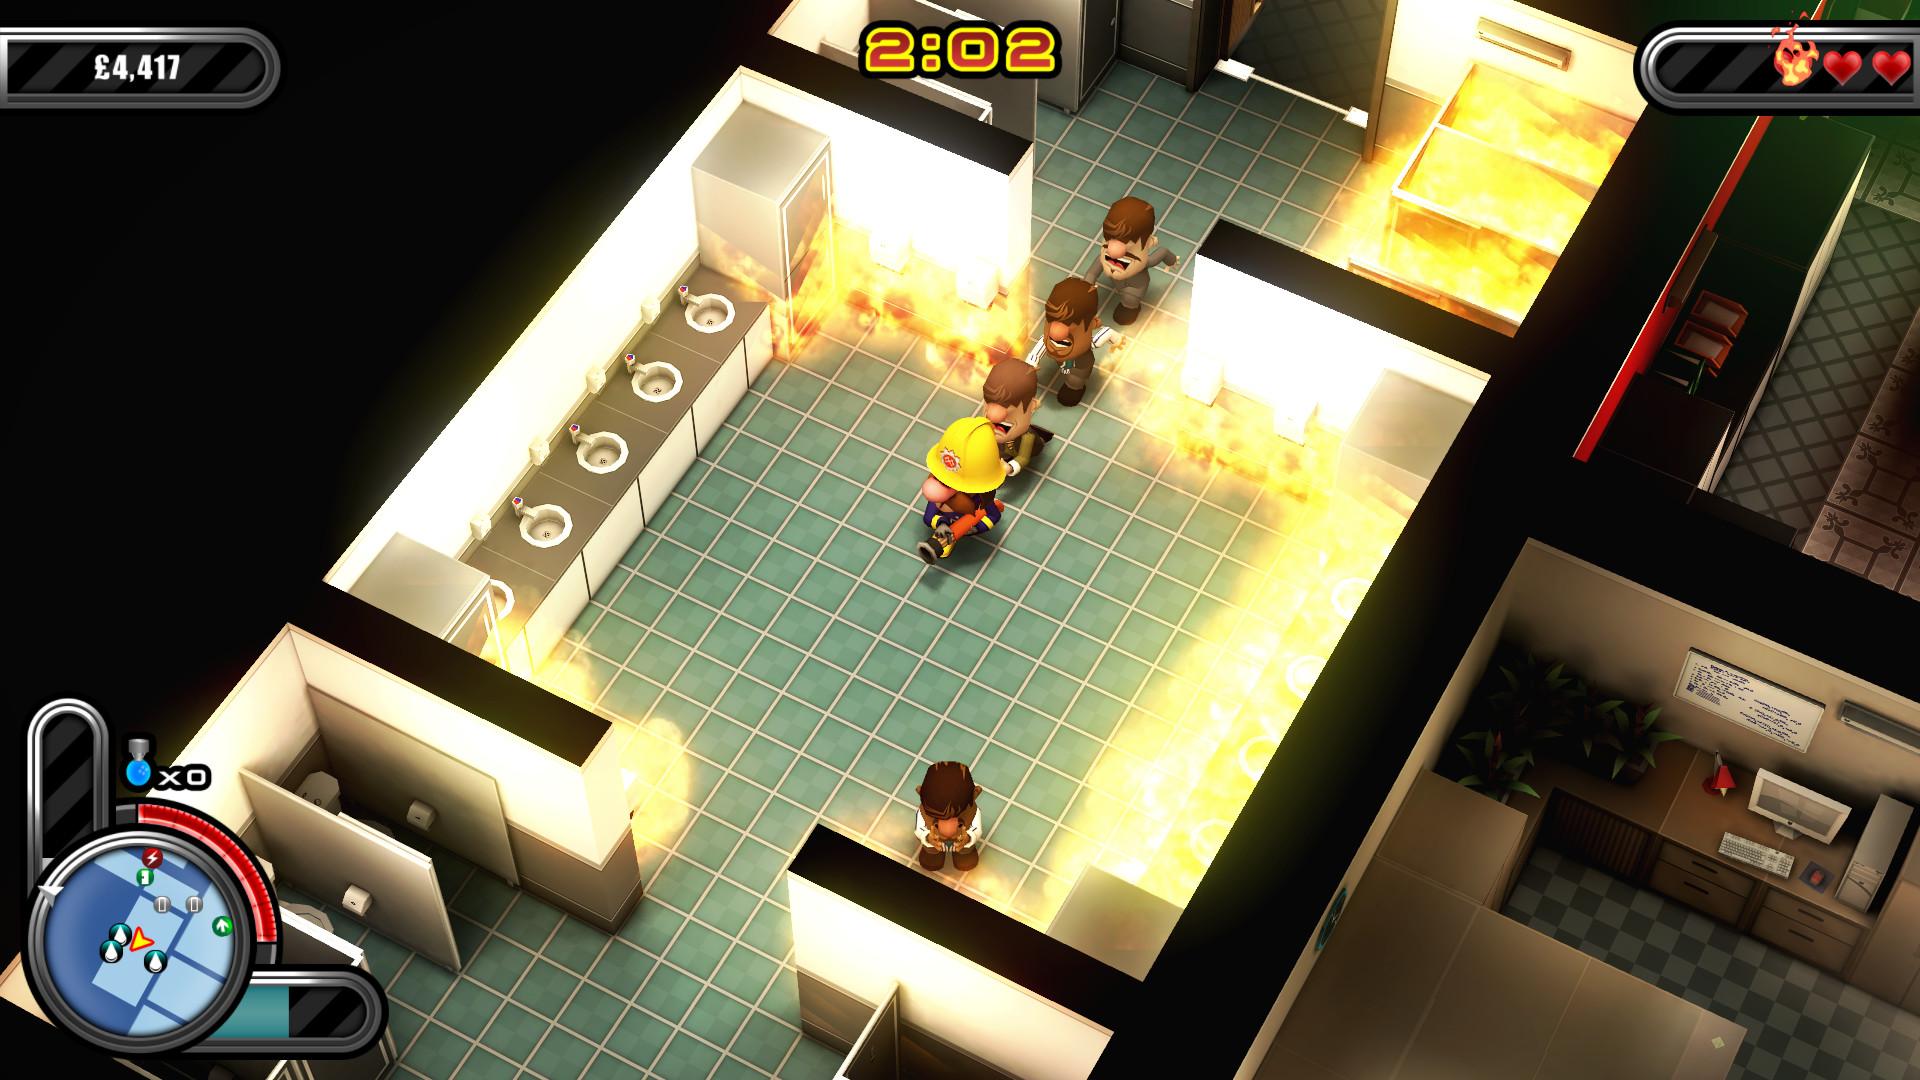 Flame Over screenshot